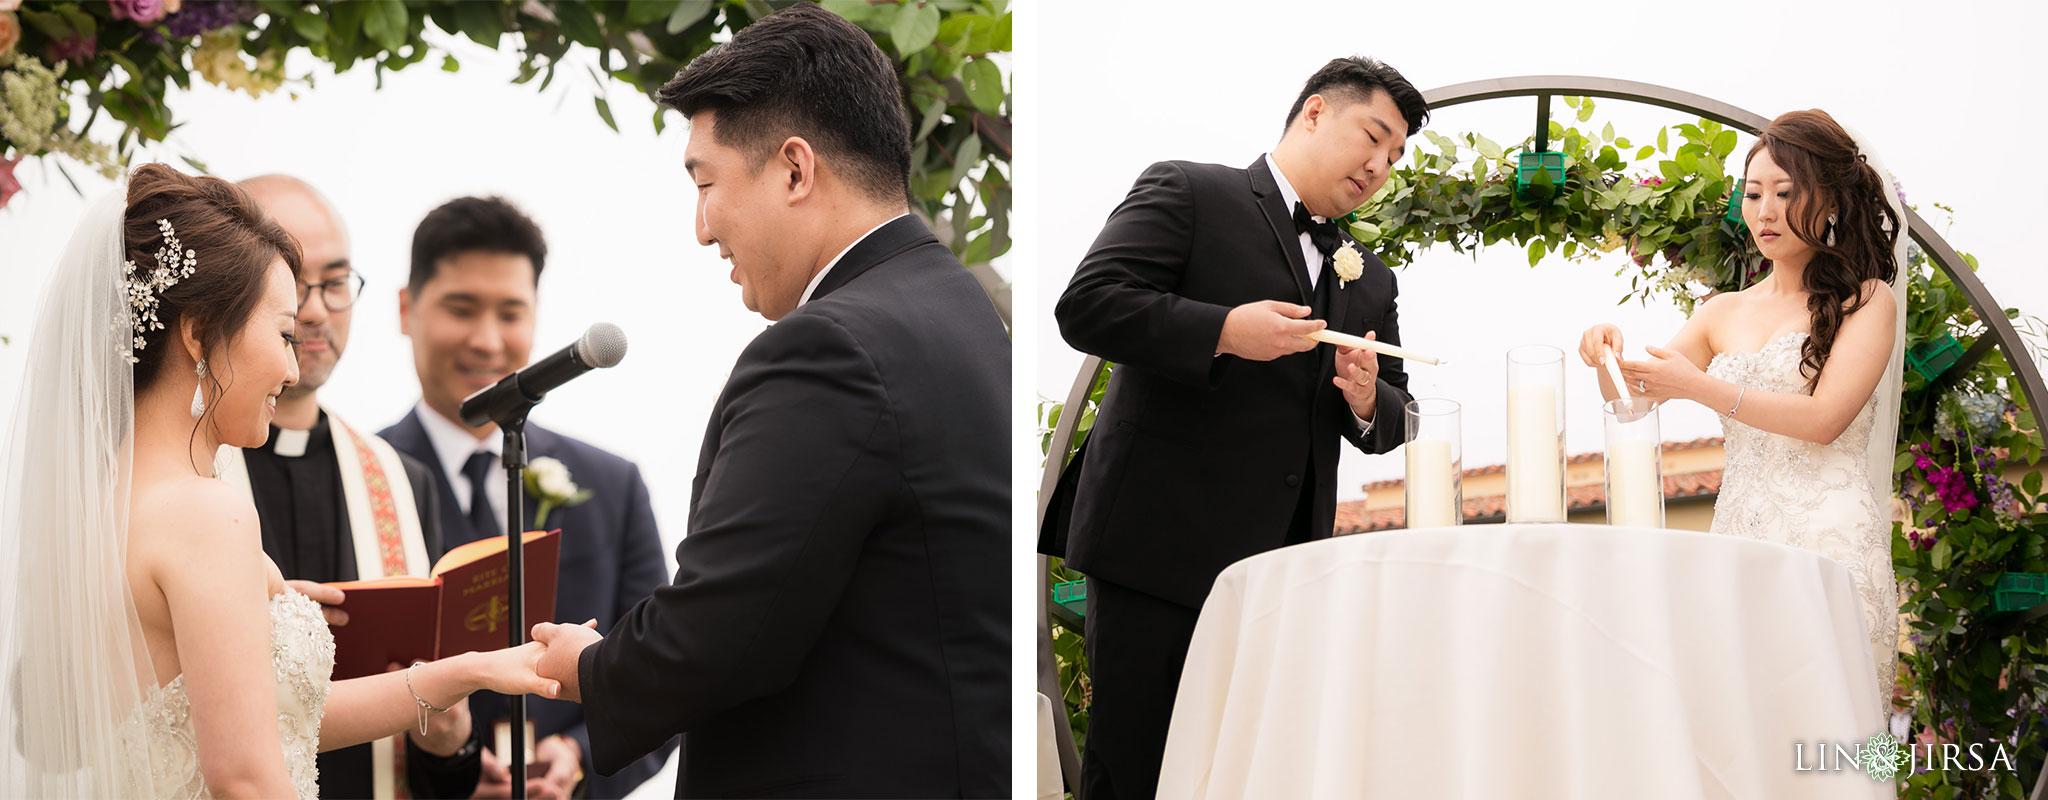 17 trump national golf club rancho palos verdes wedding ceremony photography